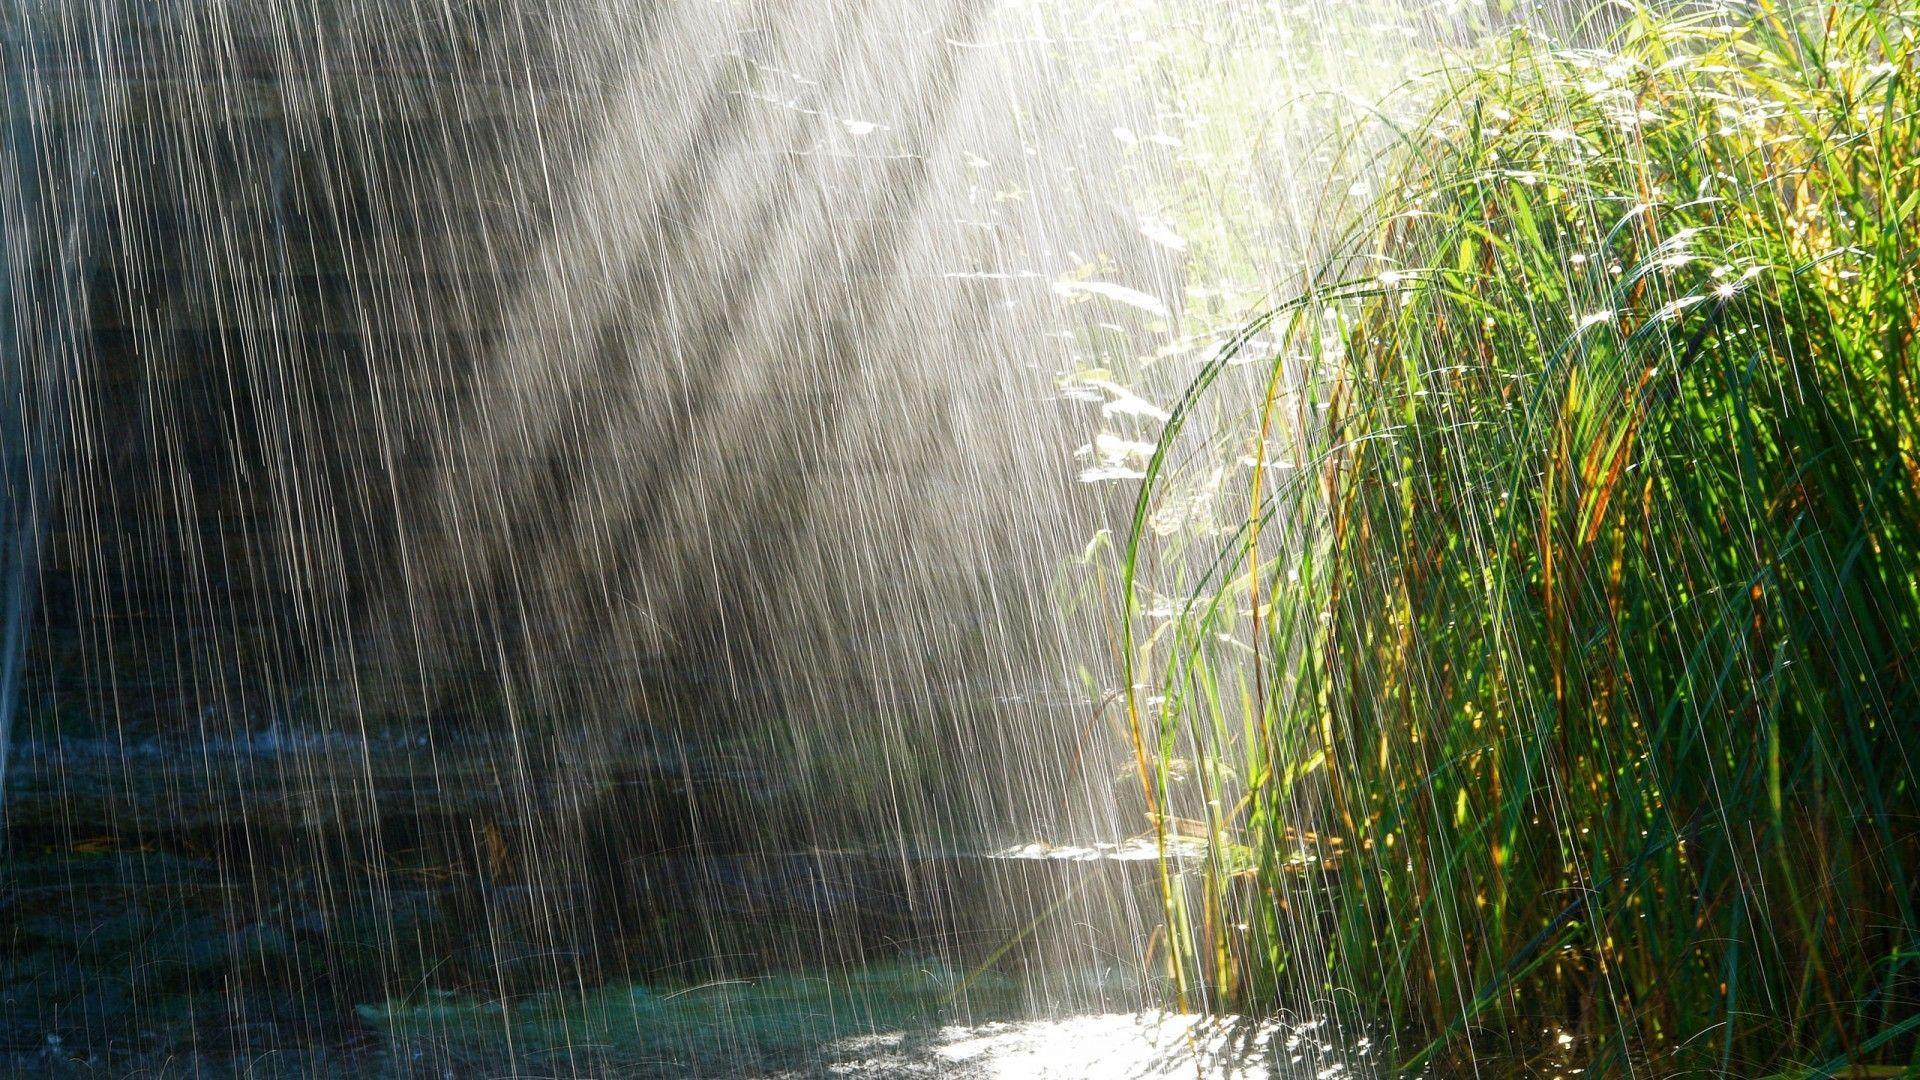 Hd wallpaper rain - Rain In Sunlight